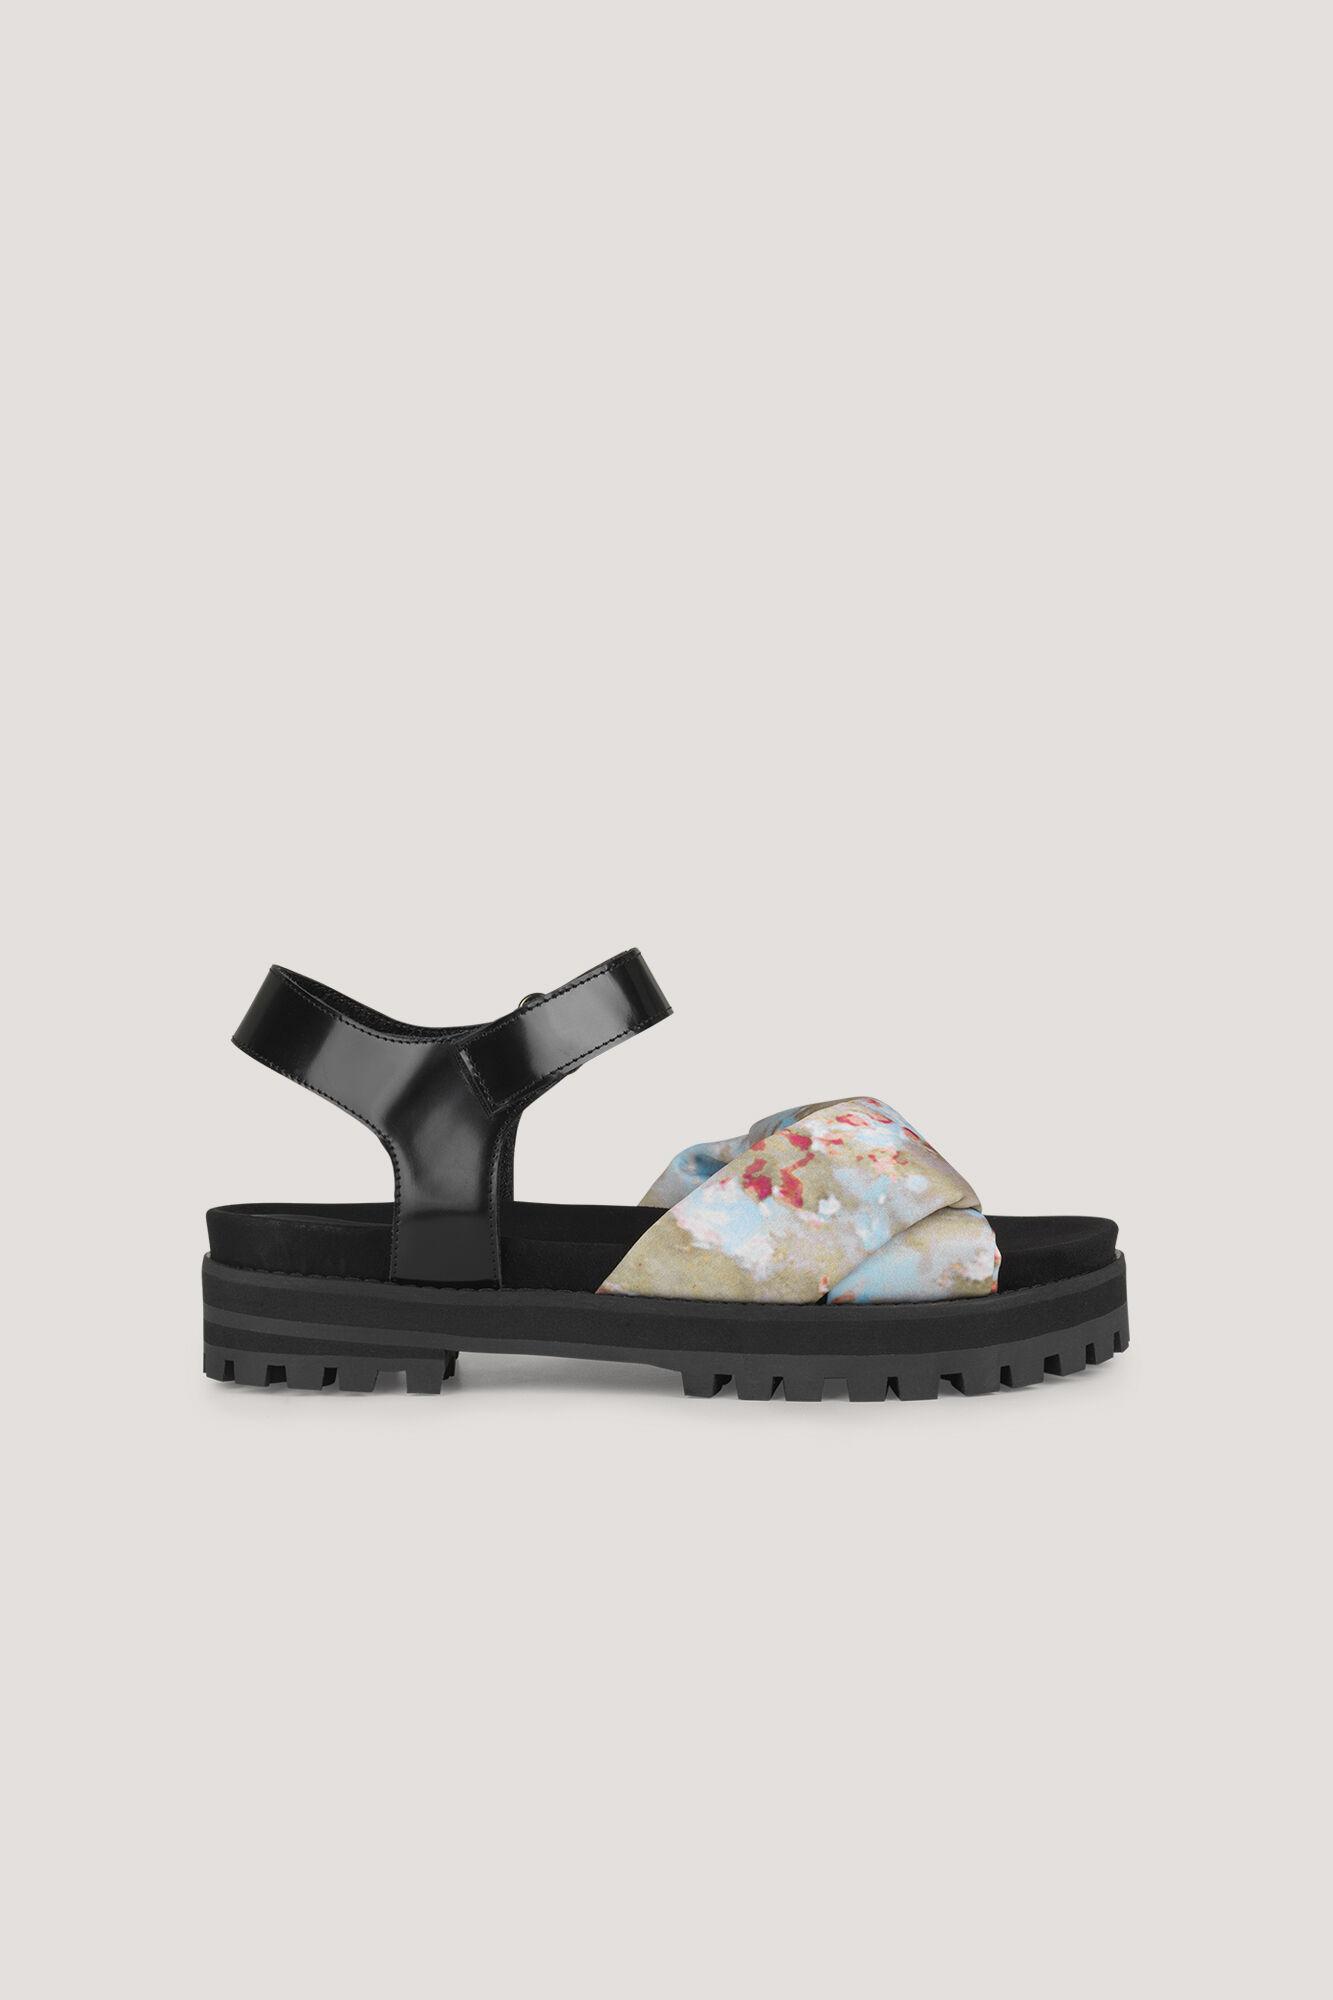 Greta sandal 10763